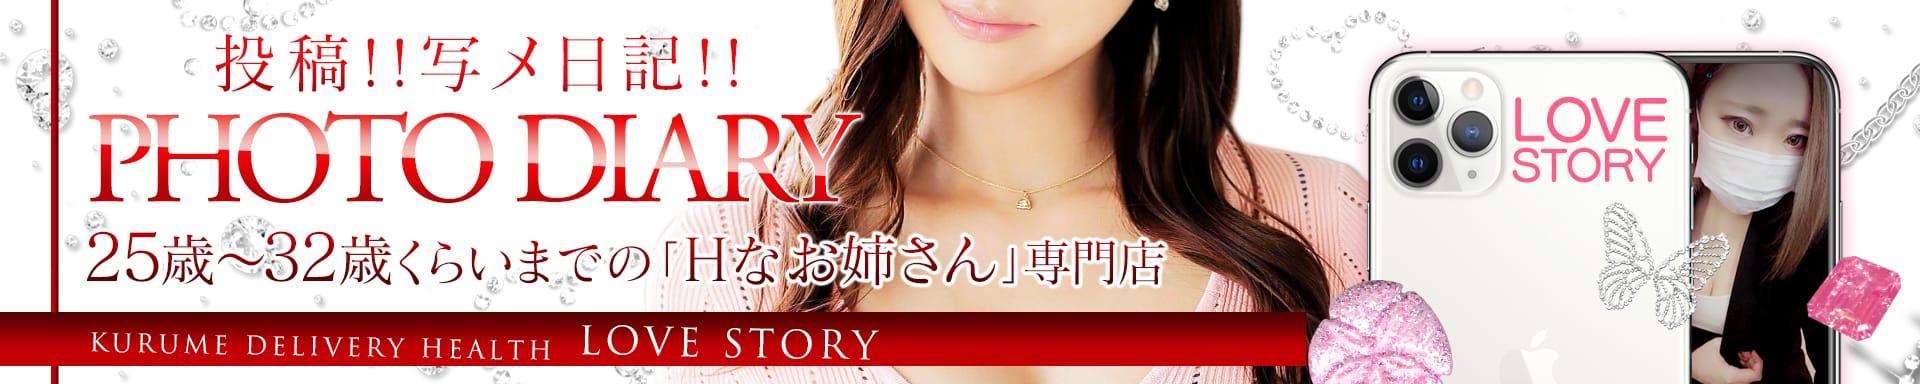 Love Story その2